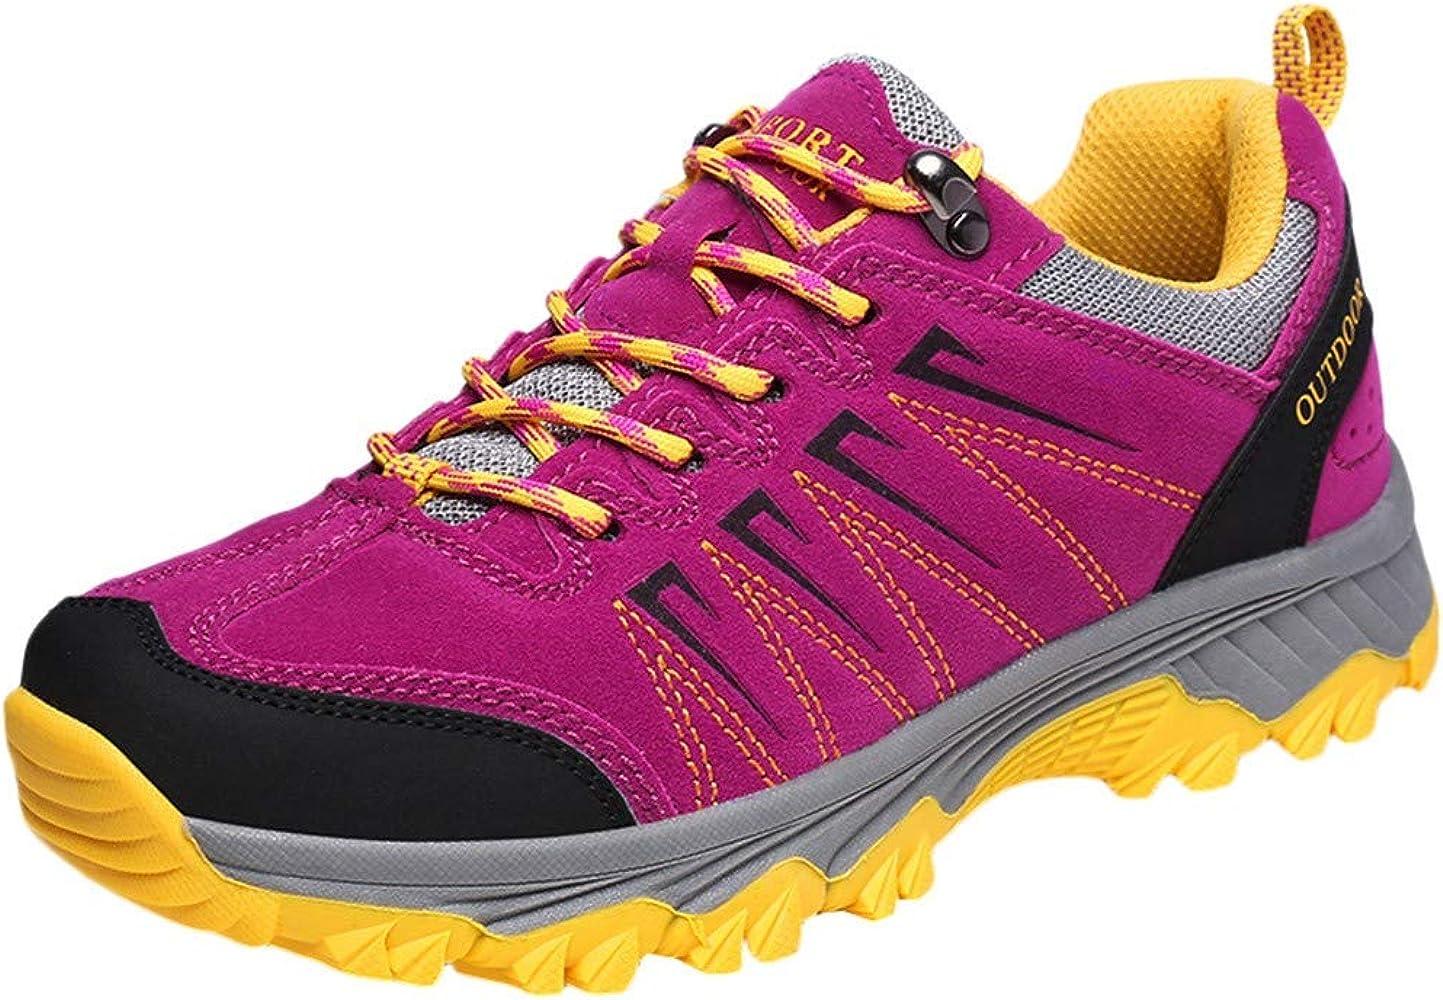 MOIKA Zapatillas deportivas para hombre, sin cordón, zapatillas de ...